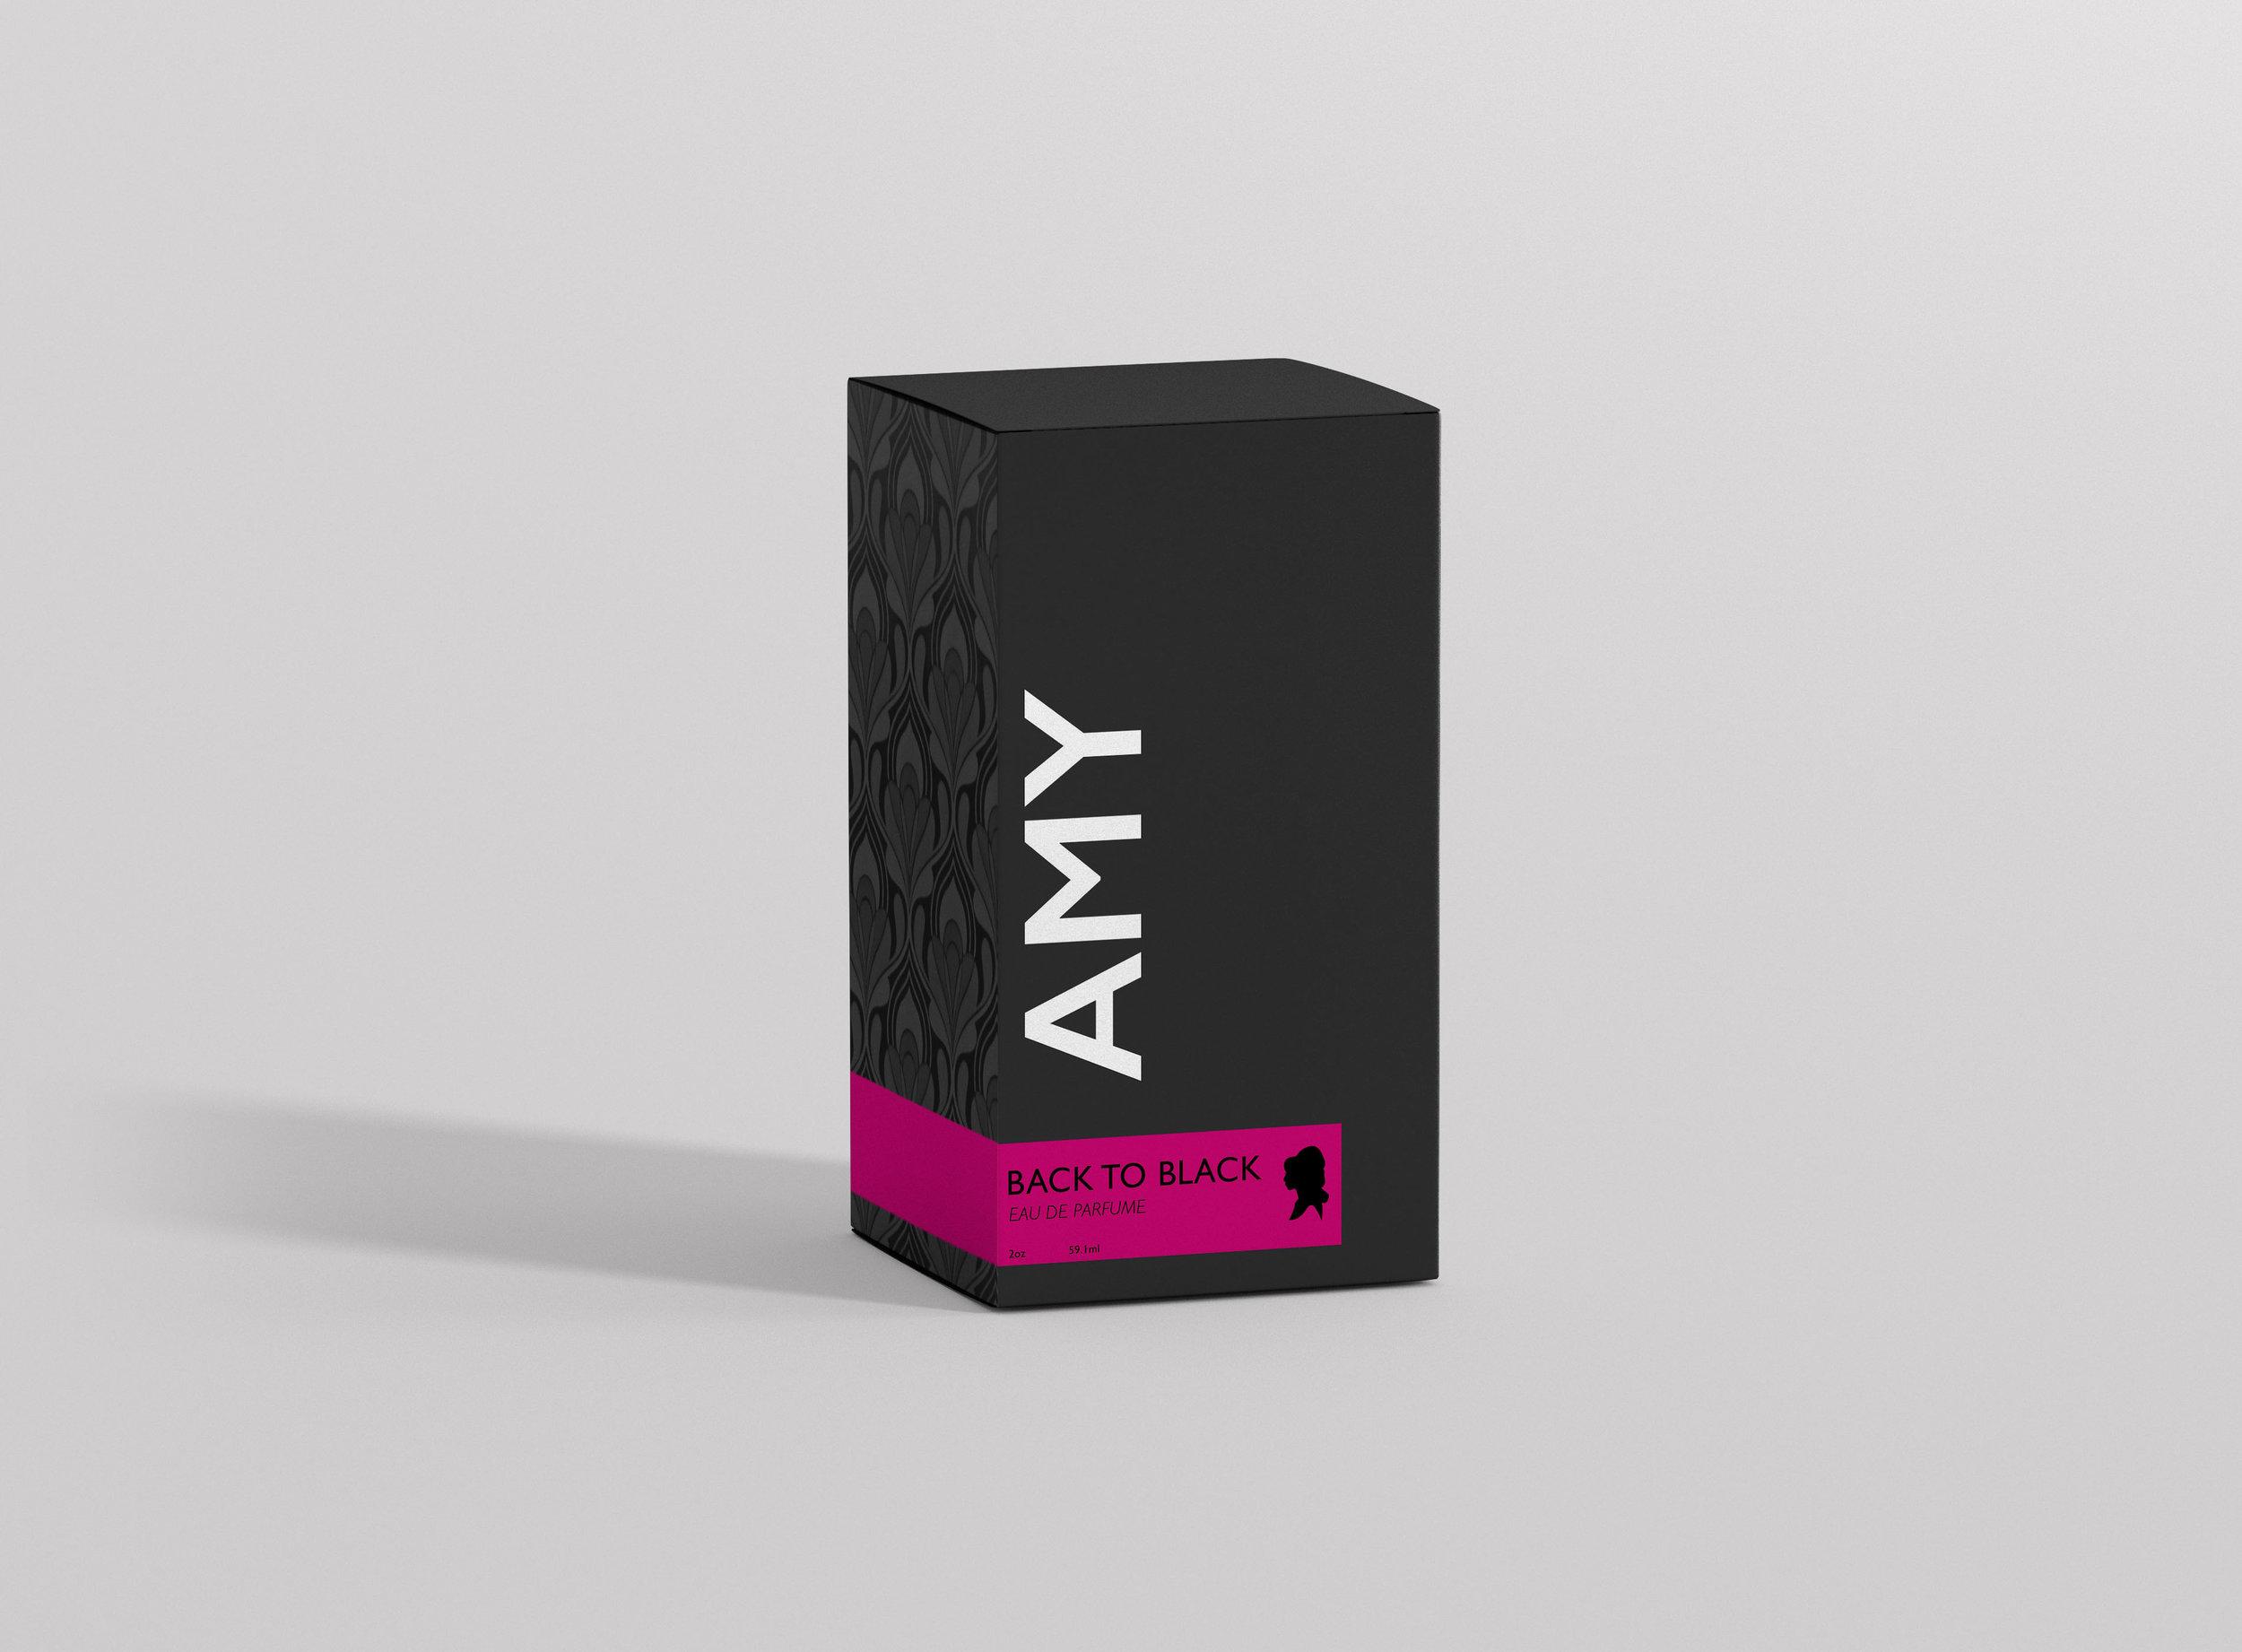 amy winehouse perfume box.jpg